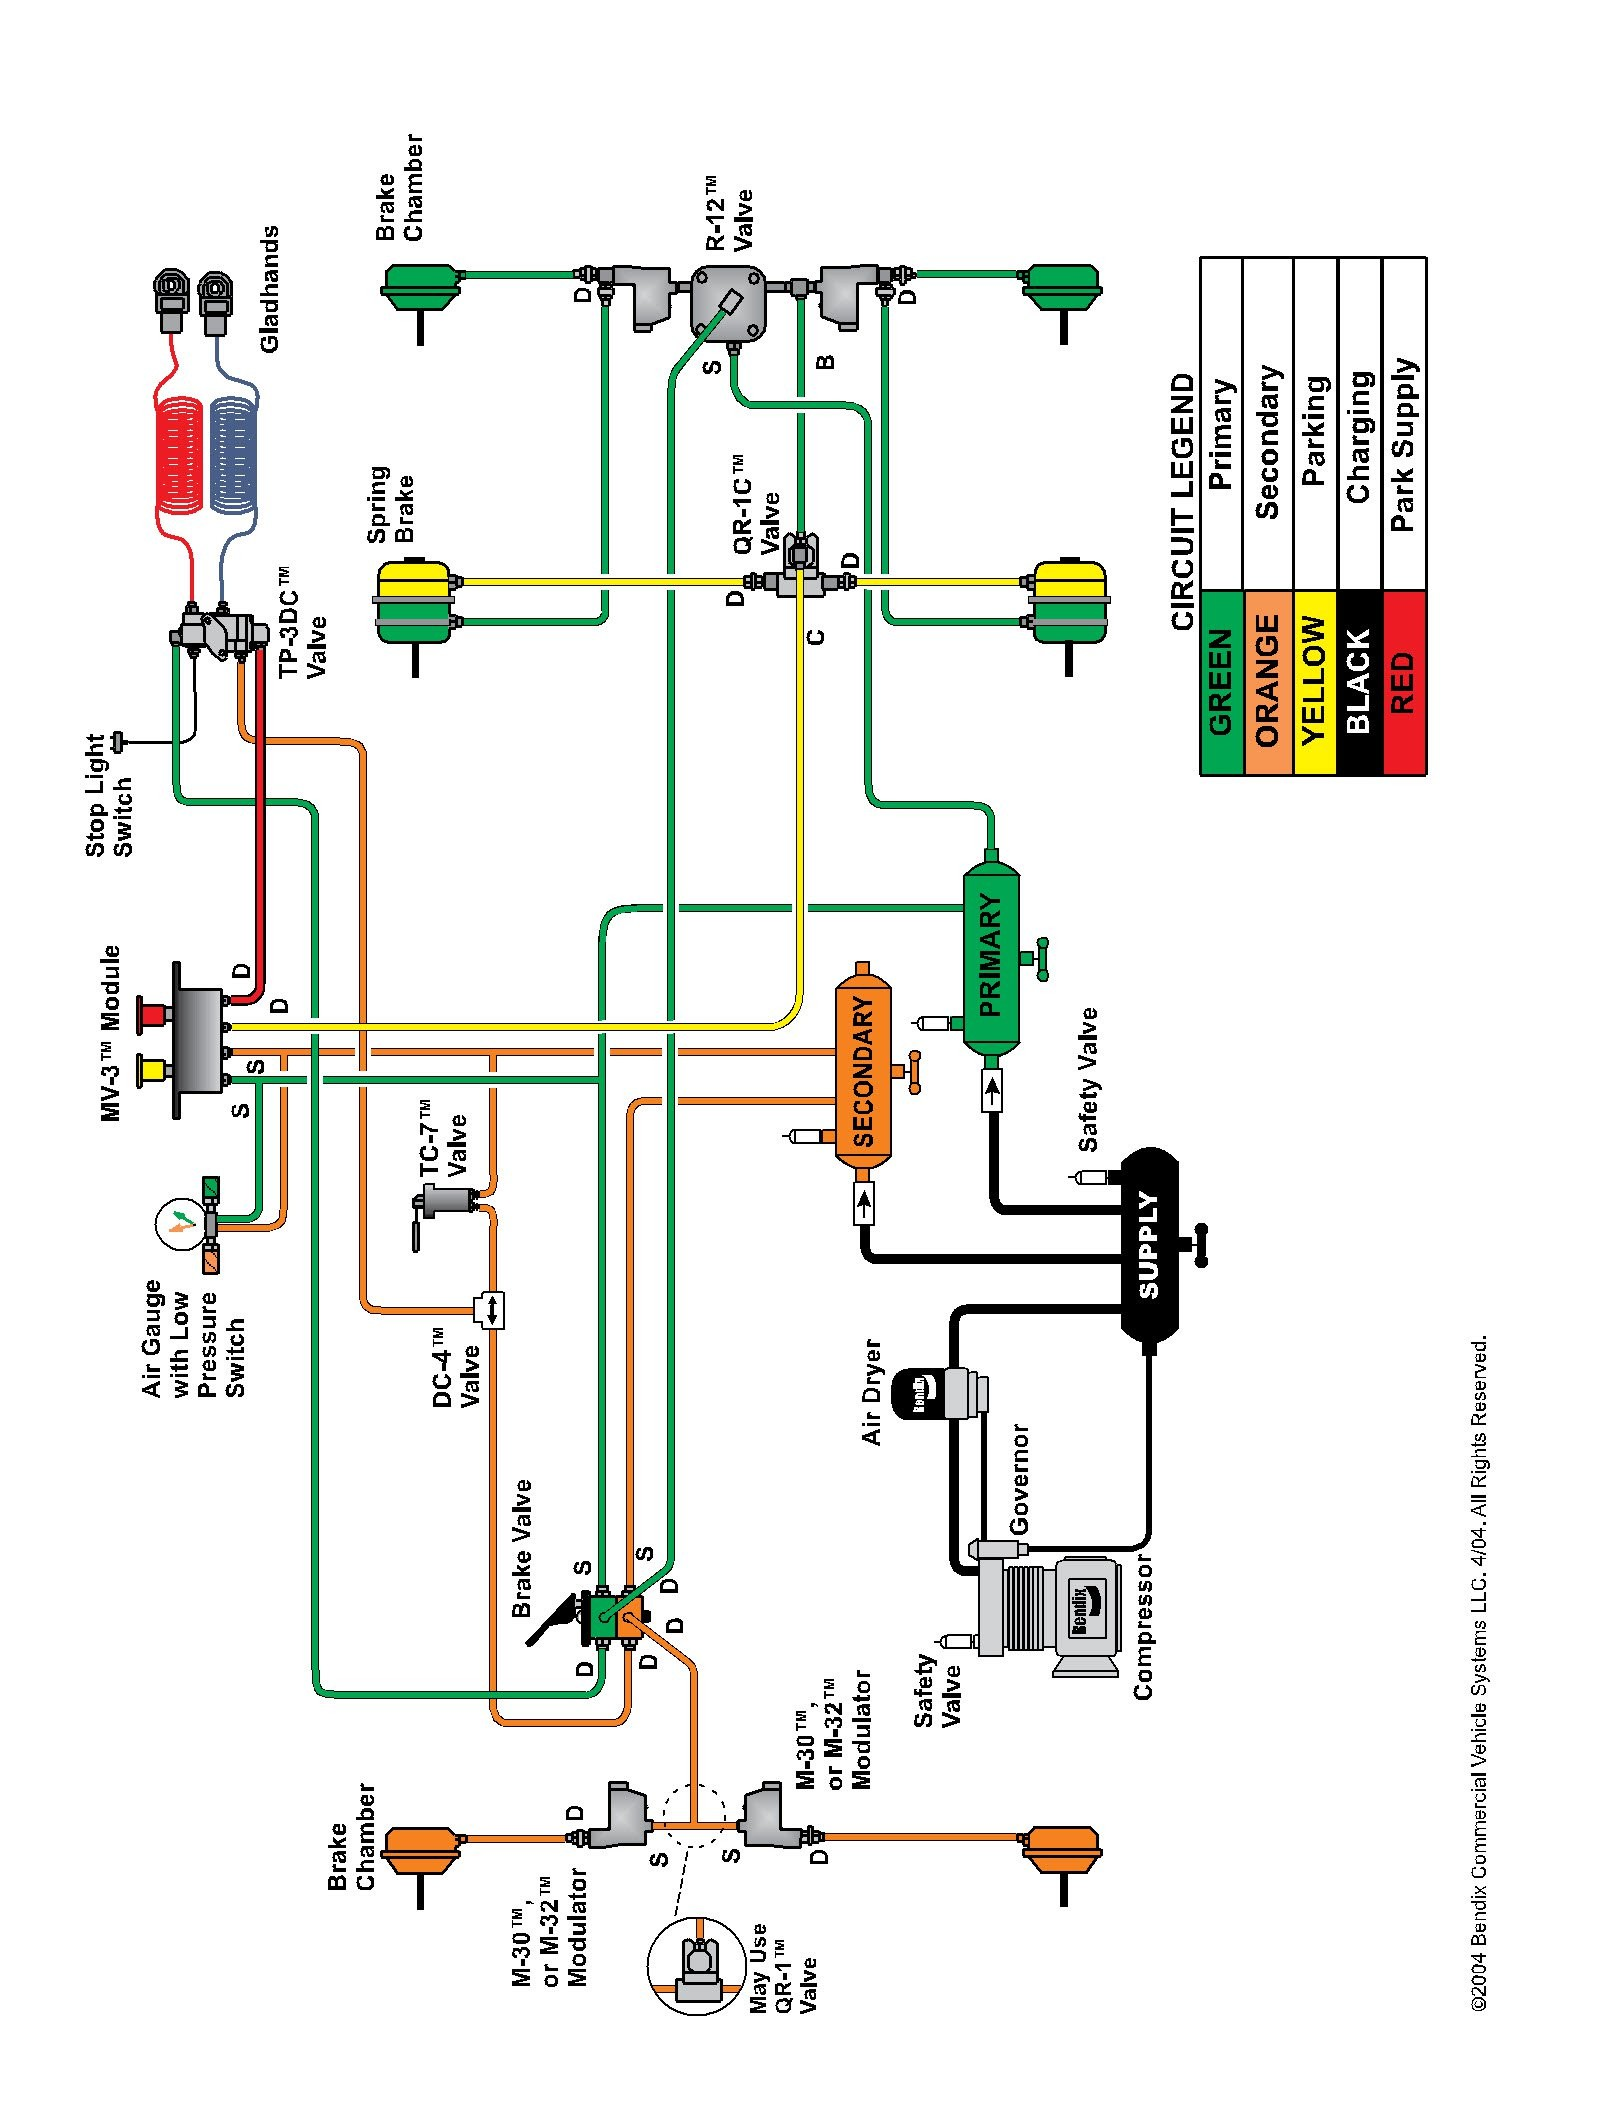 Truck Air Brake Diagram 7 3 Powerstroke Wiring Diagram Google Search Of Truck Air Brake Diagram